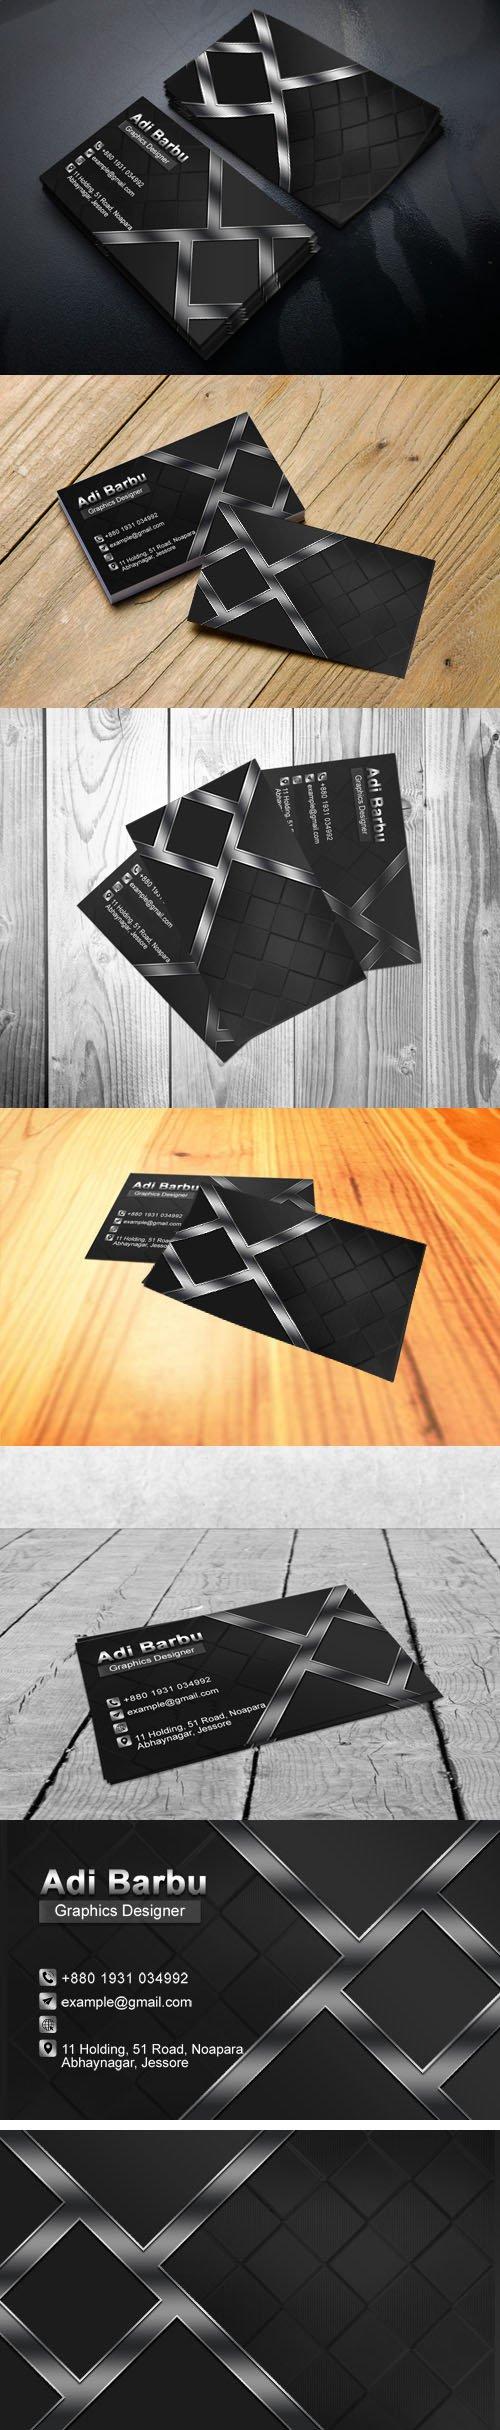 Dark Business Card Design PSD Template